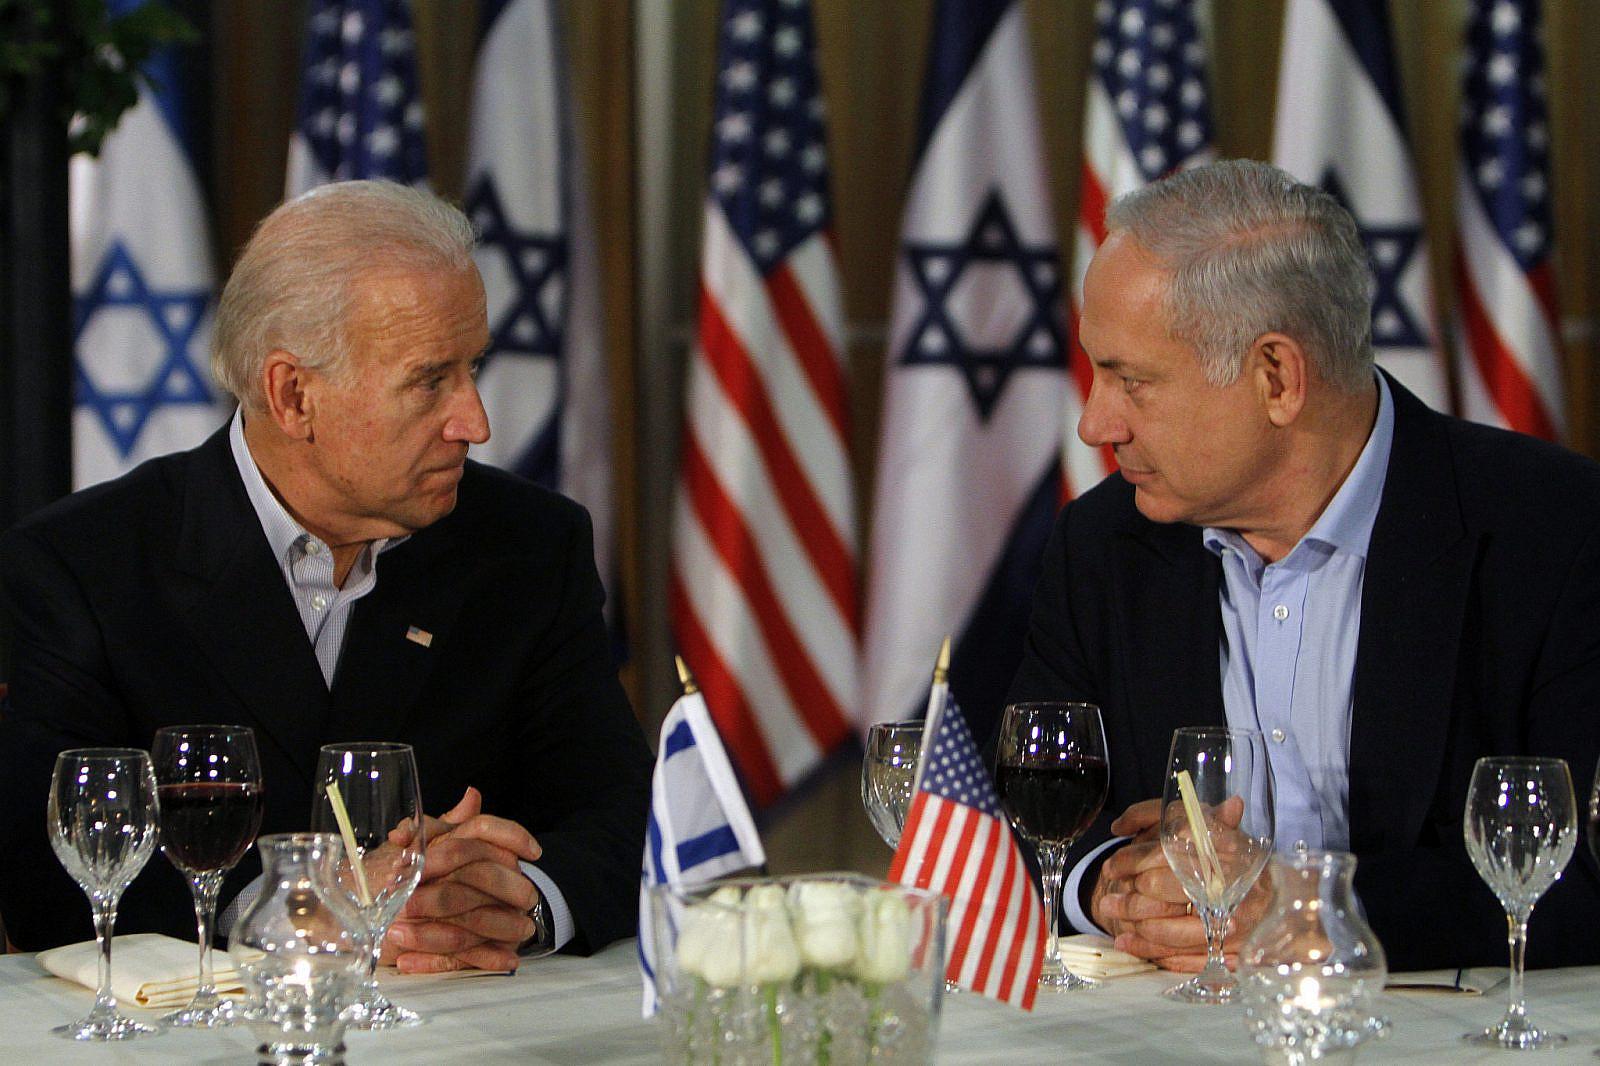 U.S. Vice President Joe Biden and Israeli Prime Minister Benjamin Netanyahu attend a dinner at the Prime Minister's residence in Jerusalem on March 09, 2010. (Miriam Alster/FLASH90)